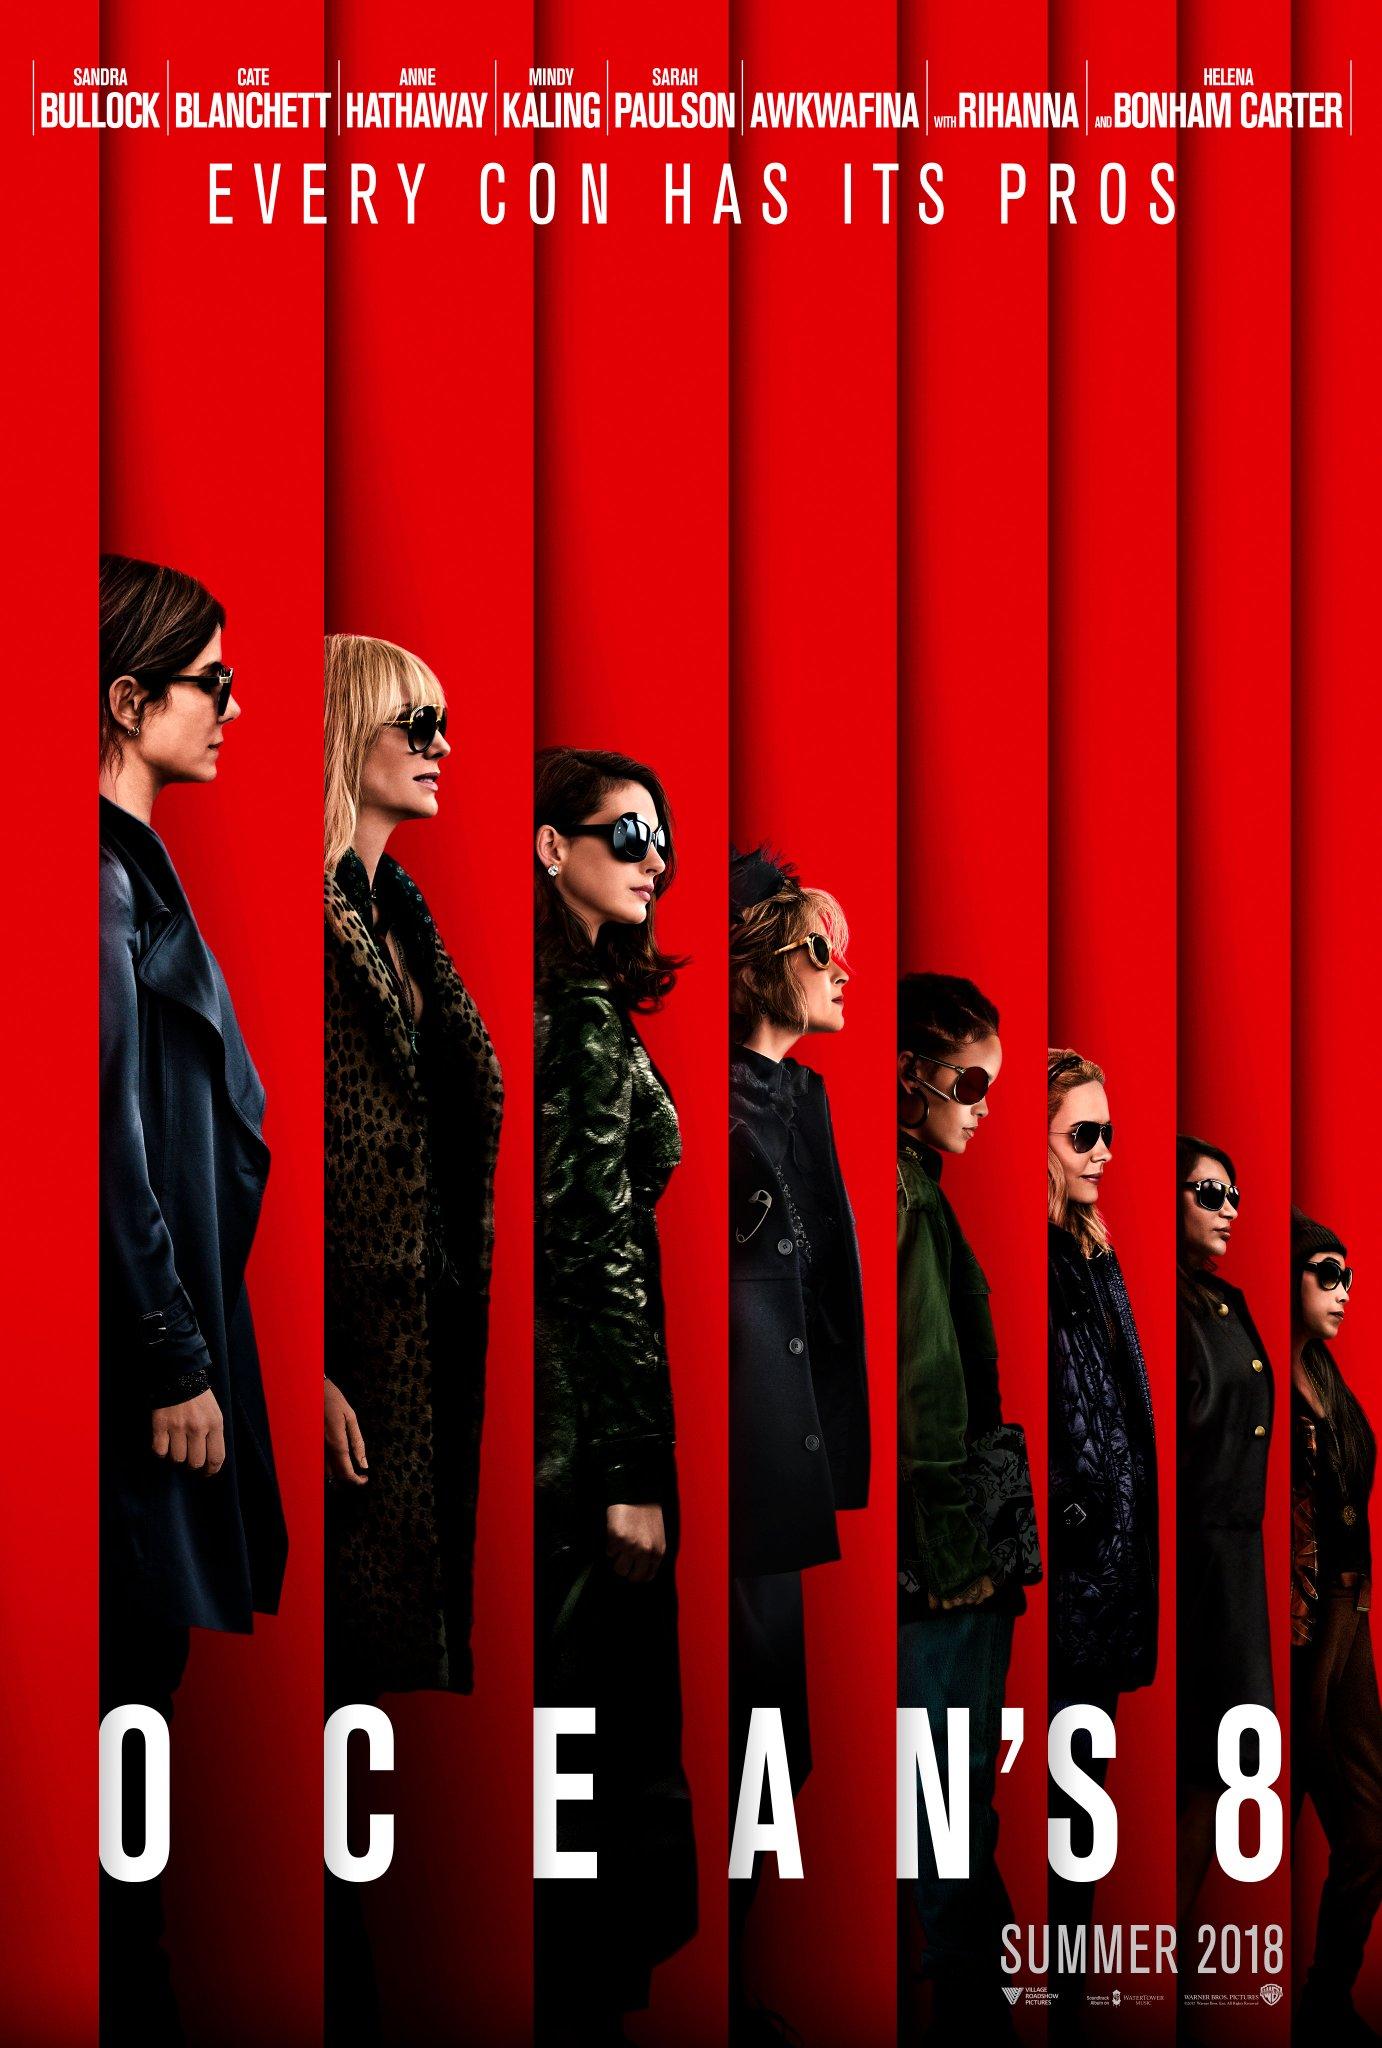 Rihanna, Sandra Bullock & Anne Hathaway Stun In New 'Oceans 8' Poster